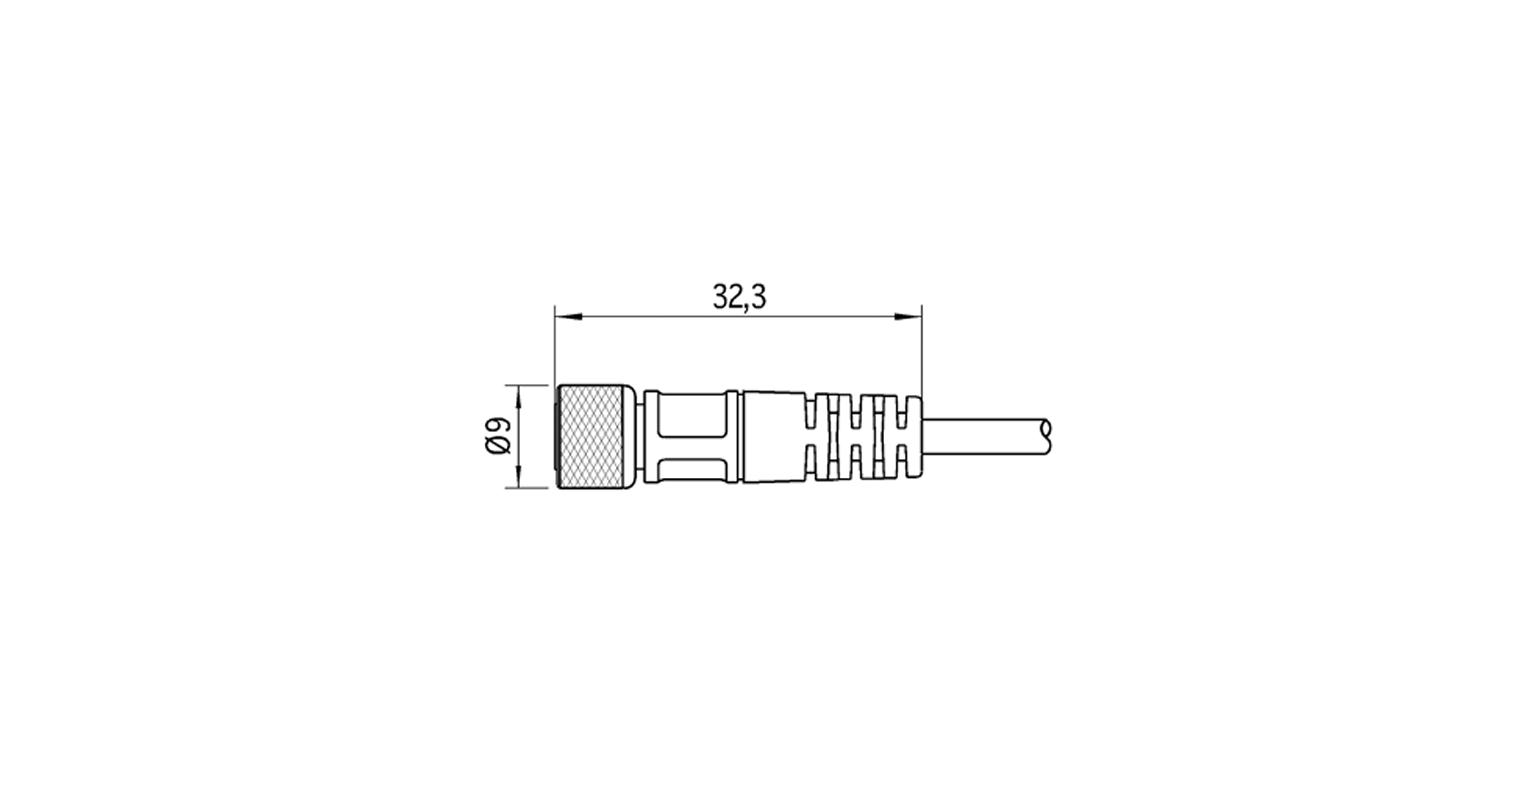 c bles kst4g 2 m8 microsonic capteur ultrason. Black Bedroom Furniture Sets. Home Design Ideas